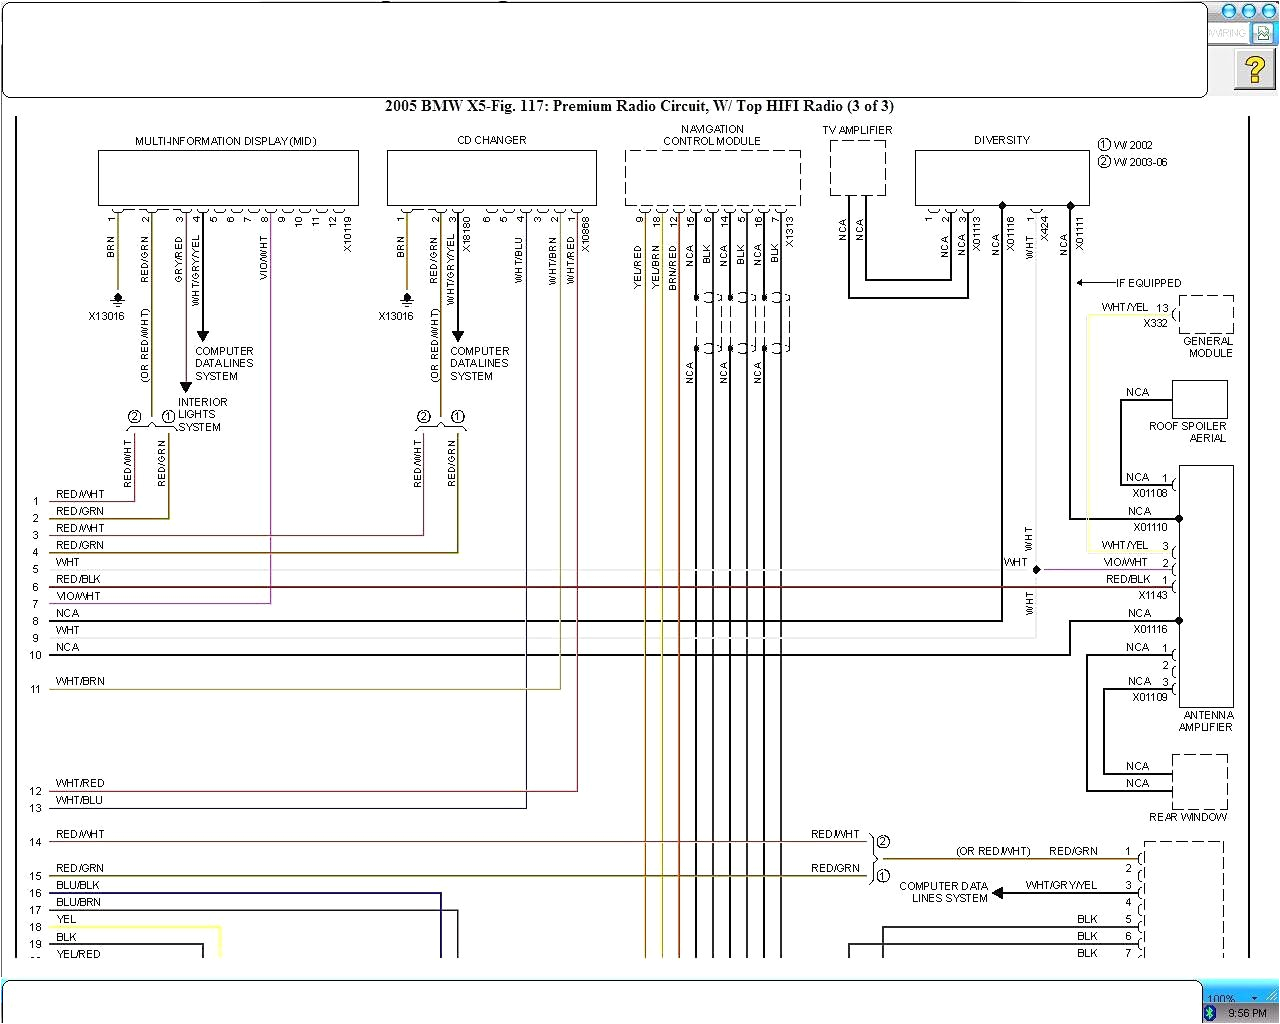 [FPER_4992]  Kc 85t Wiring Diagram. baldor 3 phase motor wiring diagram autocardesign.  no nc wiring diagram autocardesign. 2001 bmw 325i radio wiring diagram  autocardesign. rib2401b wiring diagram autocardesign. 2002 honda accord  stereo wiring | 121 Kc Wiring Diagram |  | 2002-acura-tl-radio.info